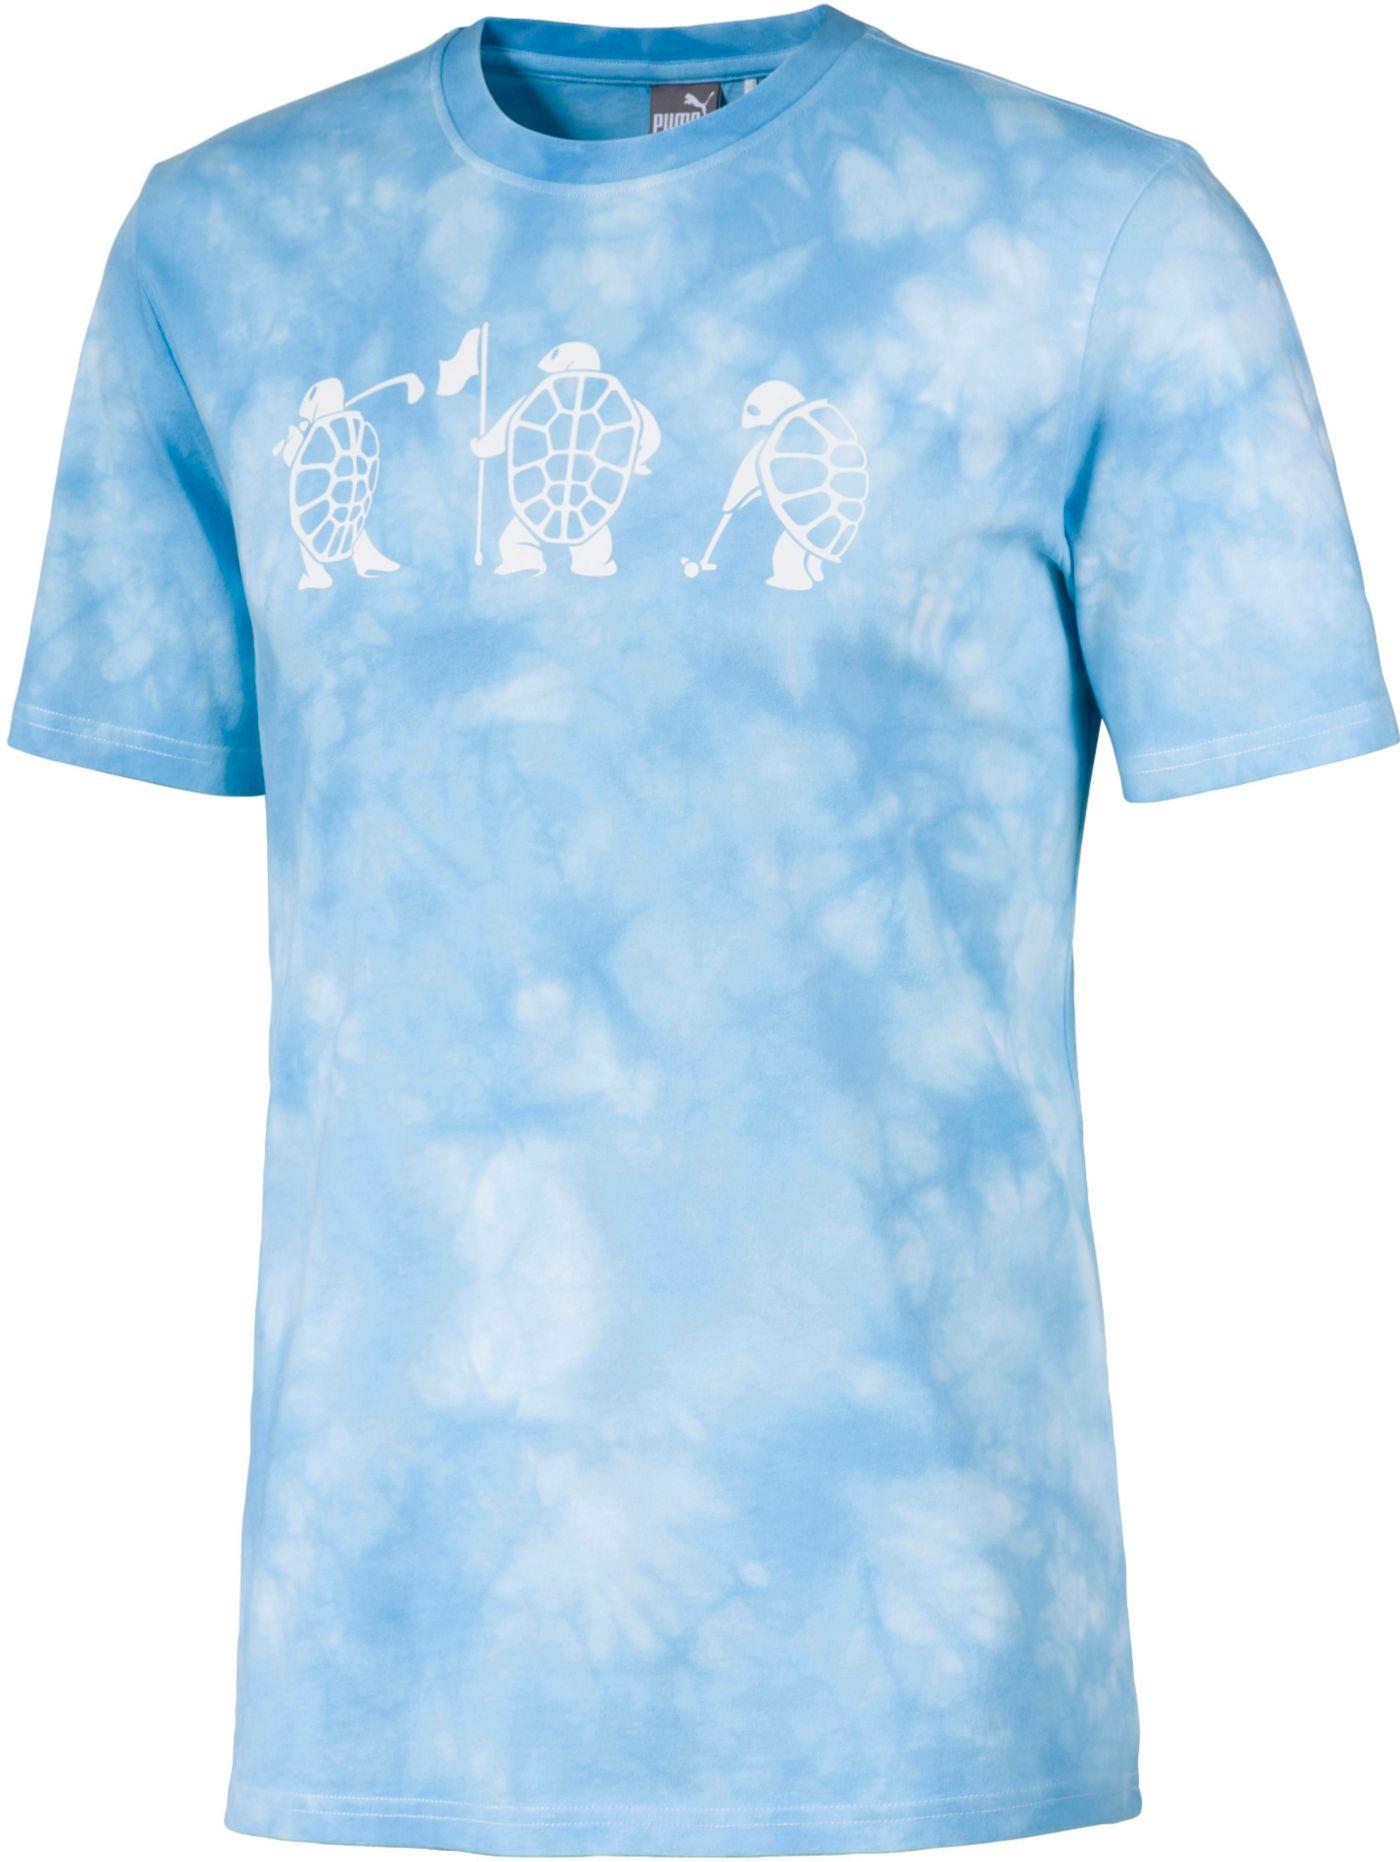 PUMA Men's Slow Play Golf T-Shirt